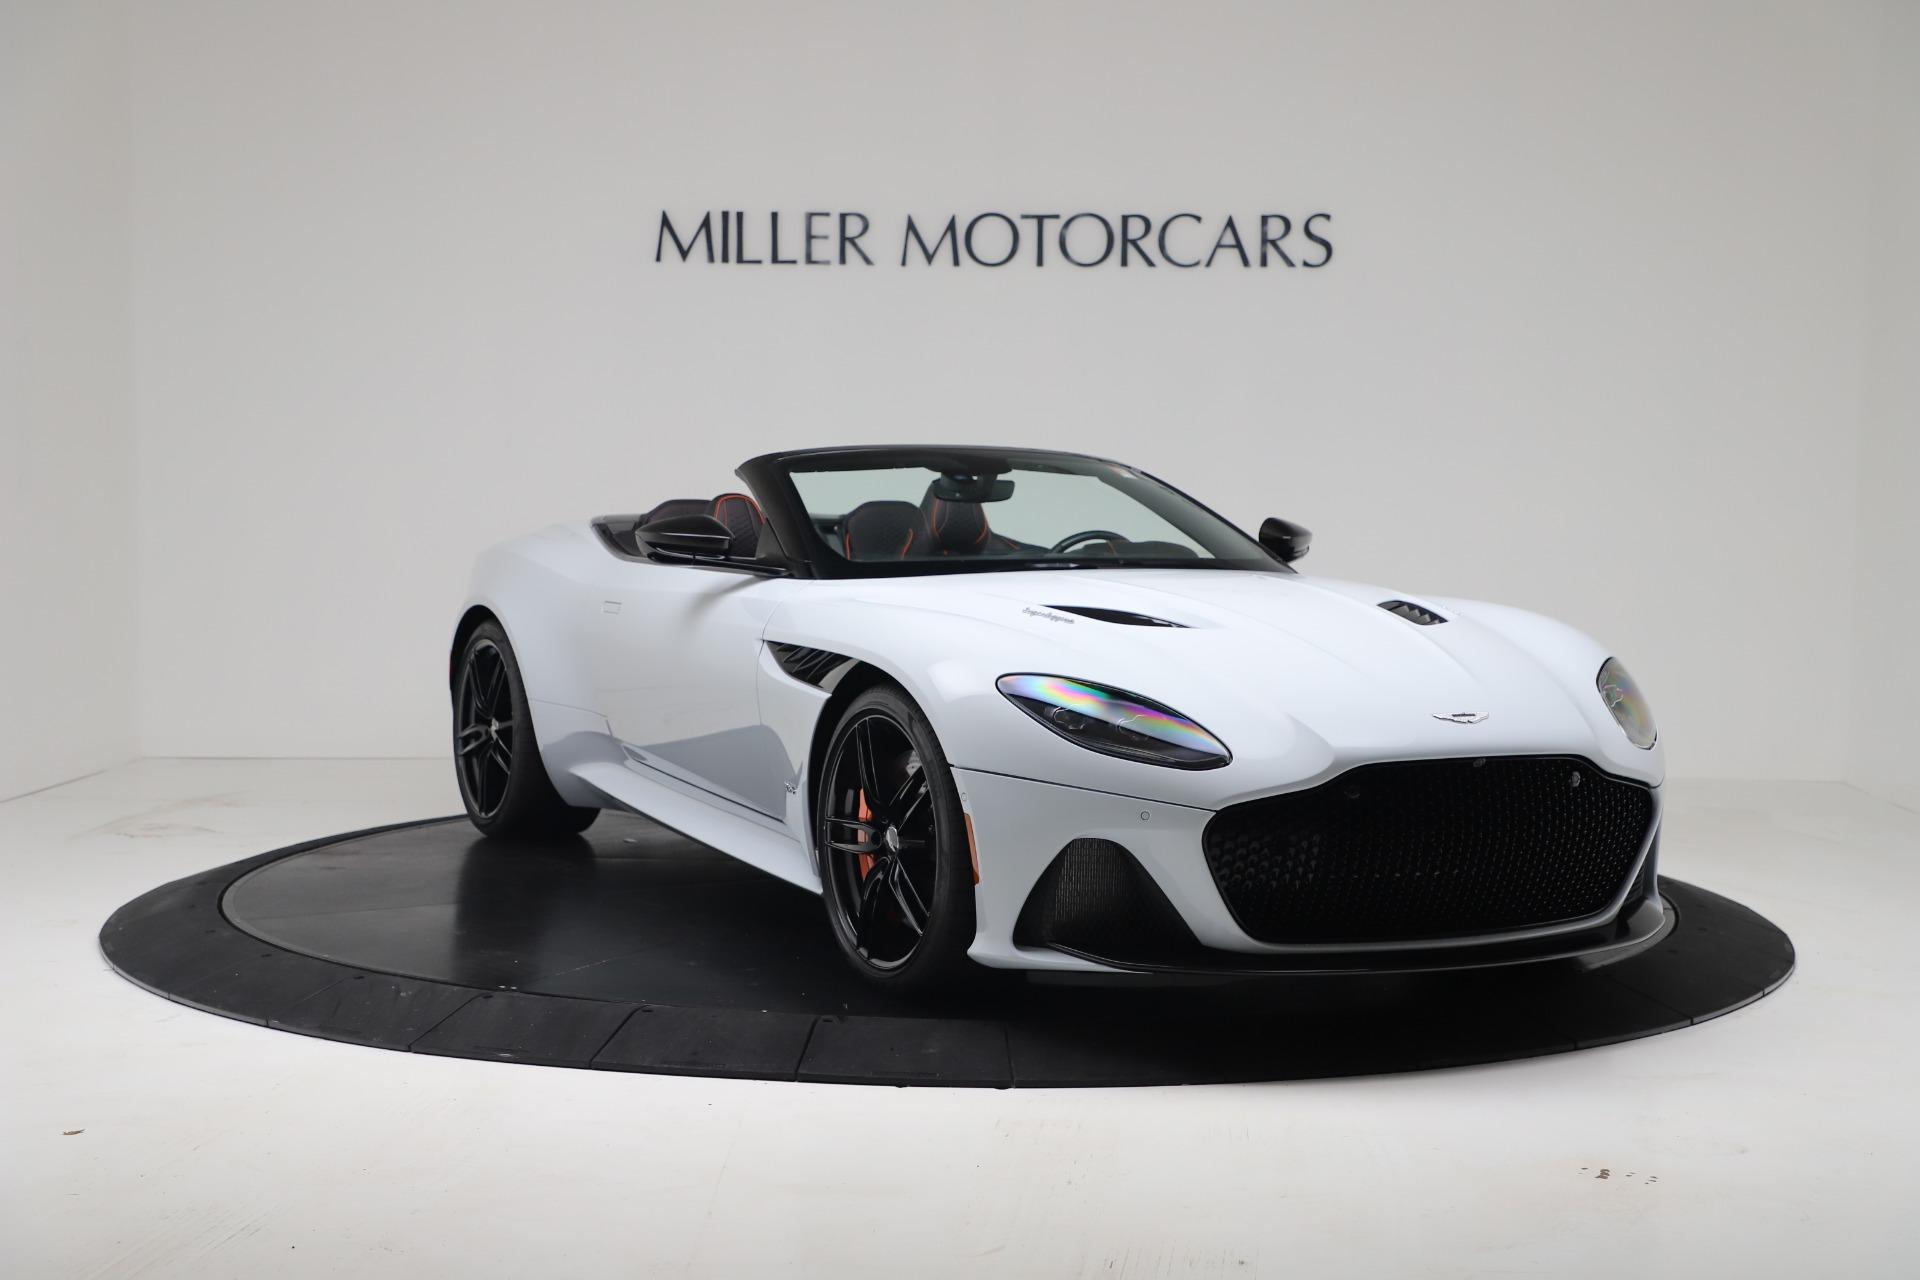 New 2020 Aston Martin DBS Superleggera Volante Convertible For Sale In Westport, CT 3484_p10